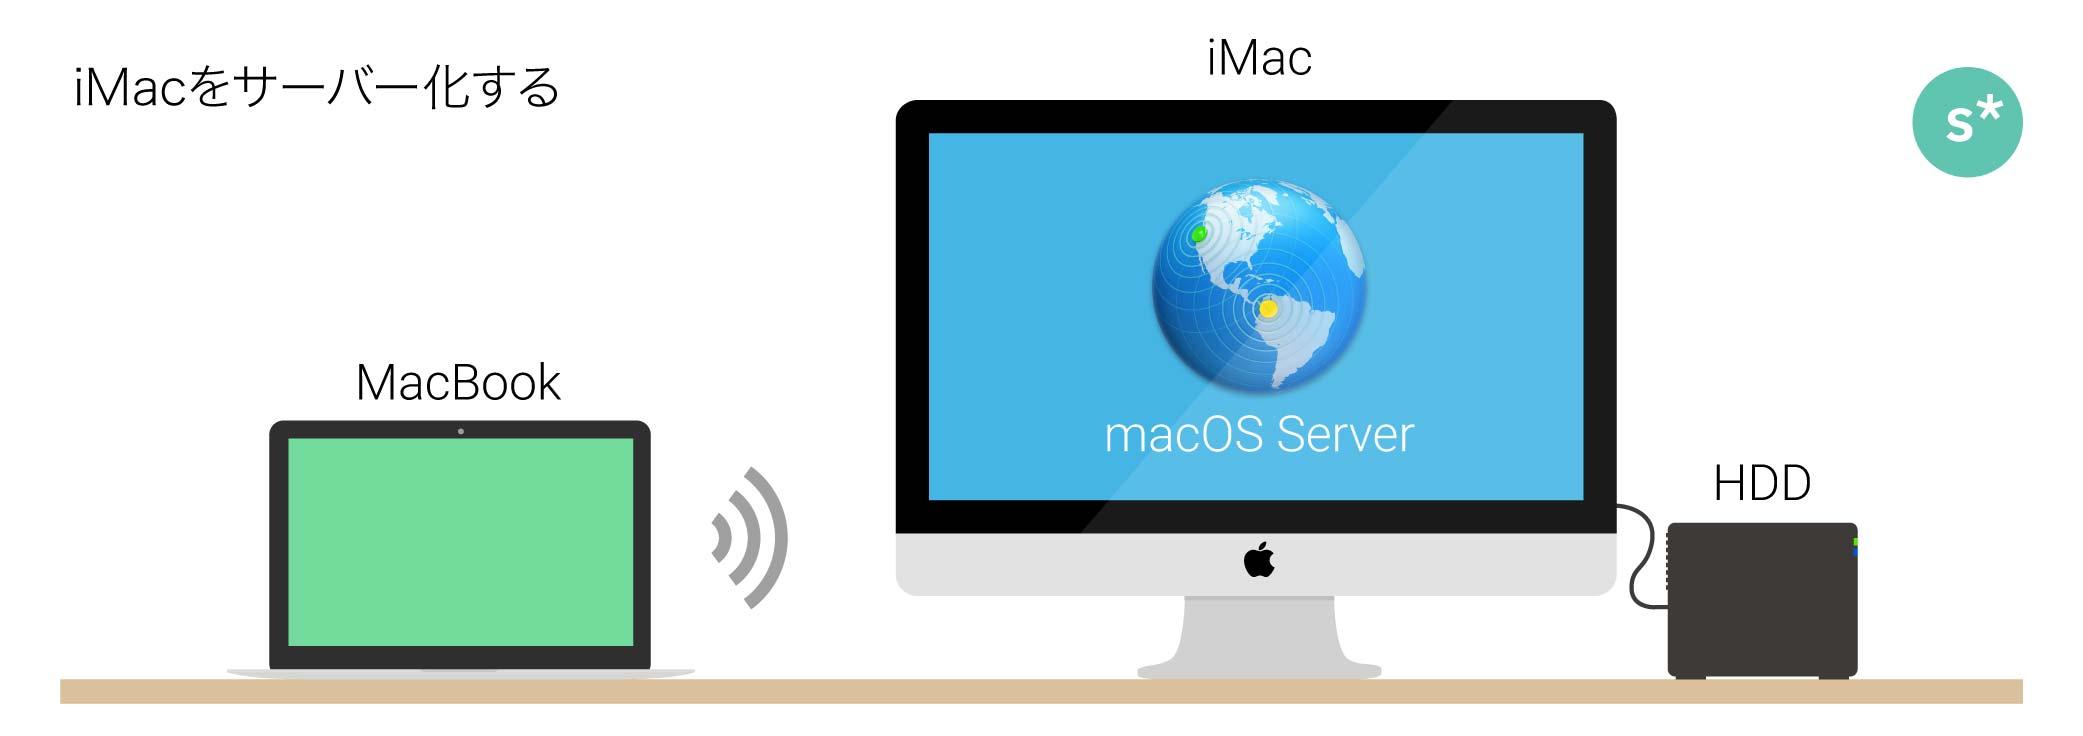 2mac_server